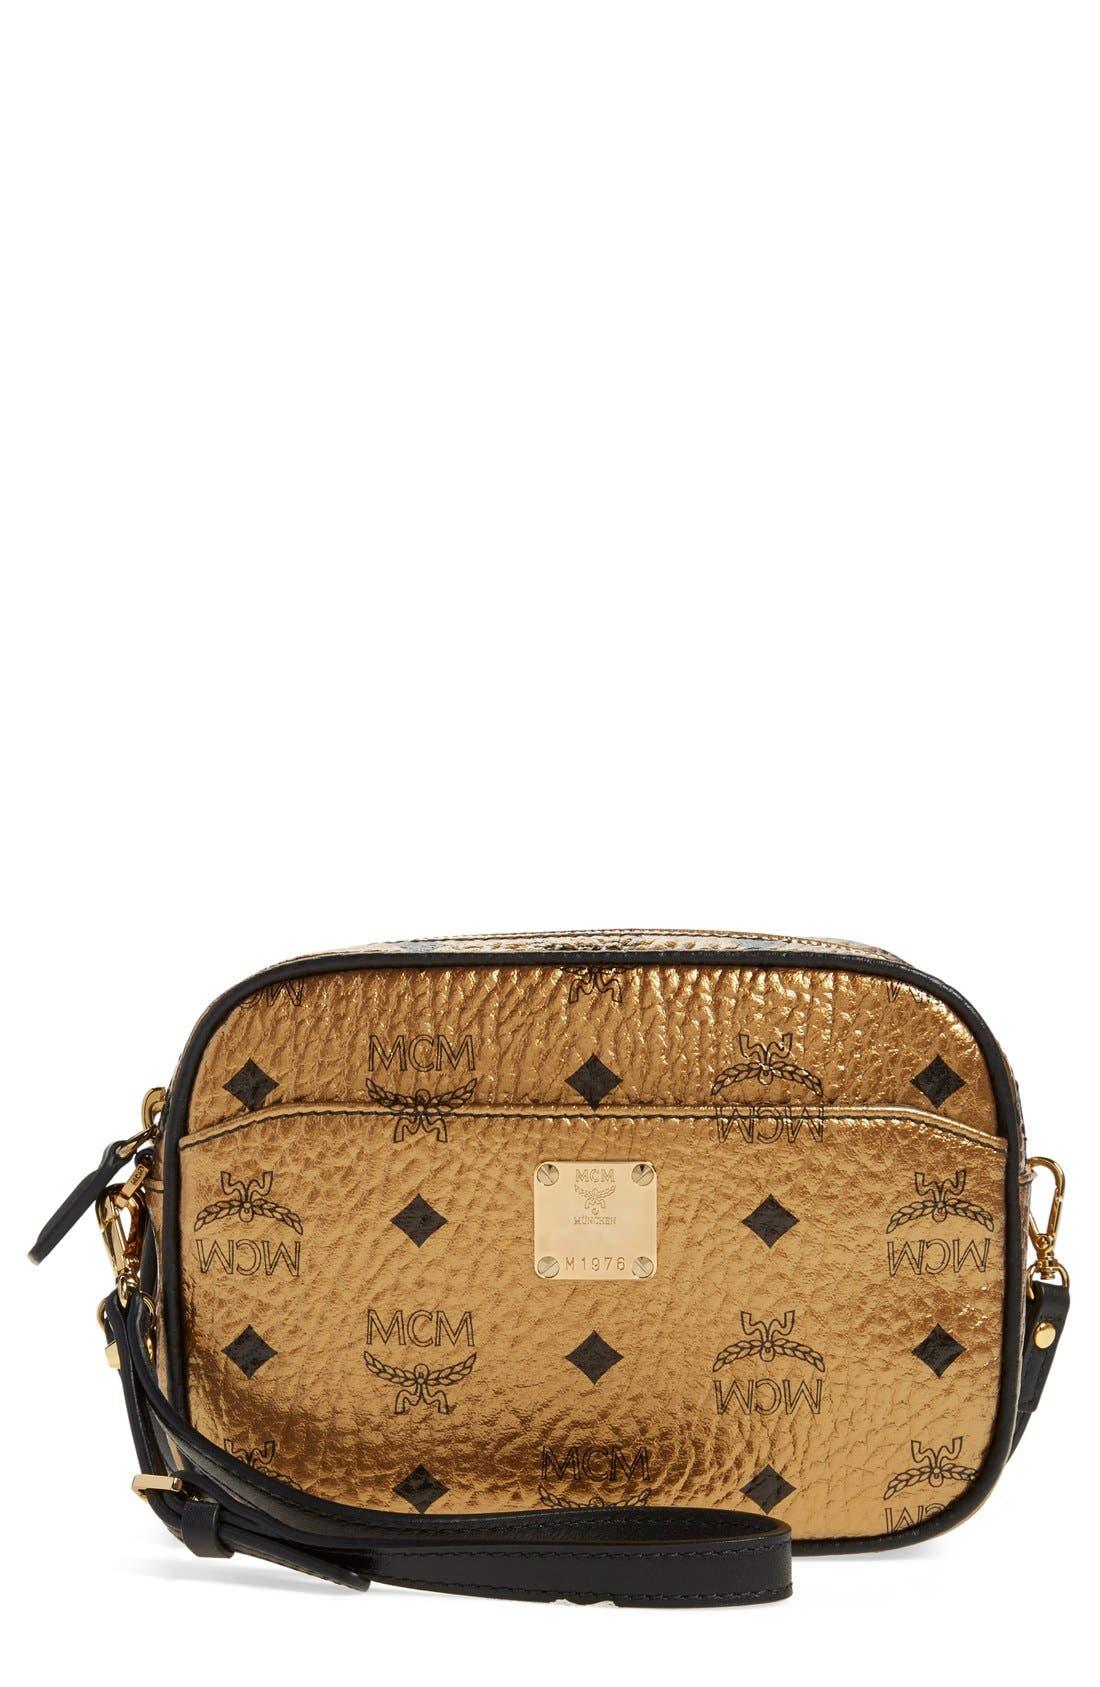 Main Image - MCM 'Heritage - Visetos' Metallic Coated Canvas Crossbody Bag (Nordstrom Exclusive)